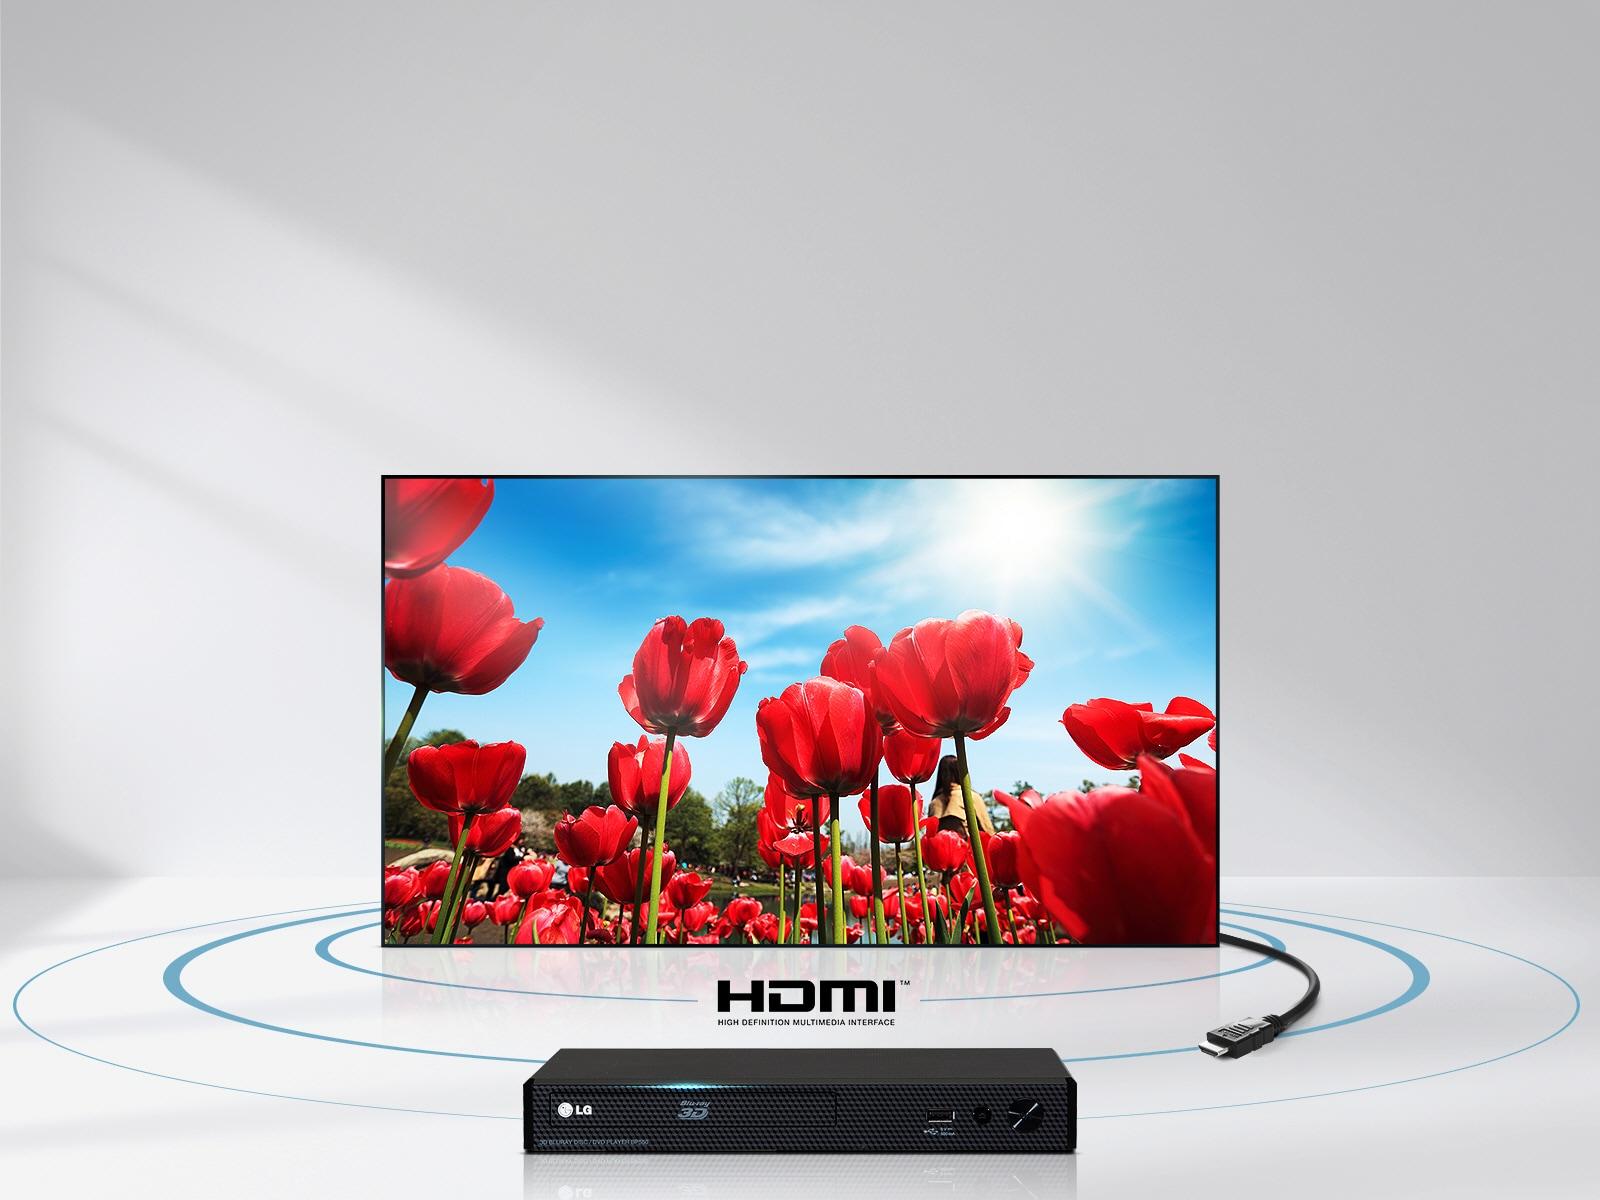 03_LJ50_A_MEA_HDMI